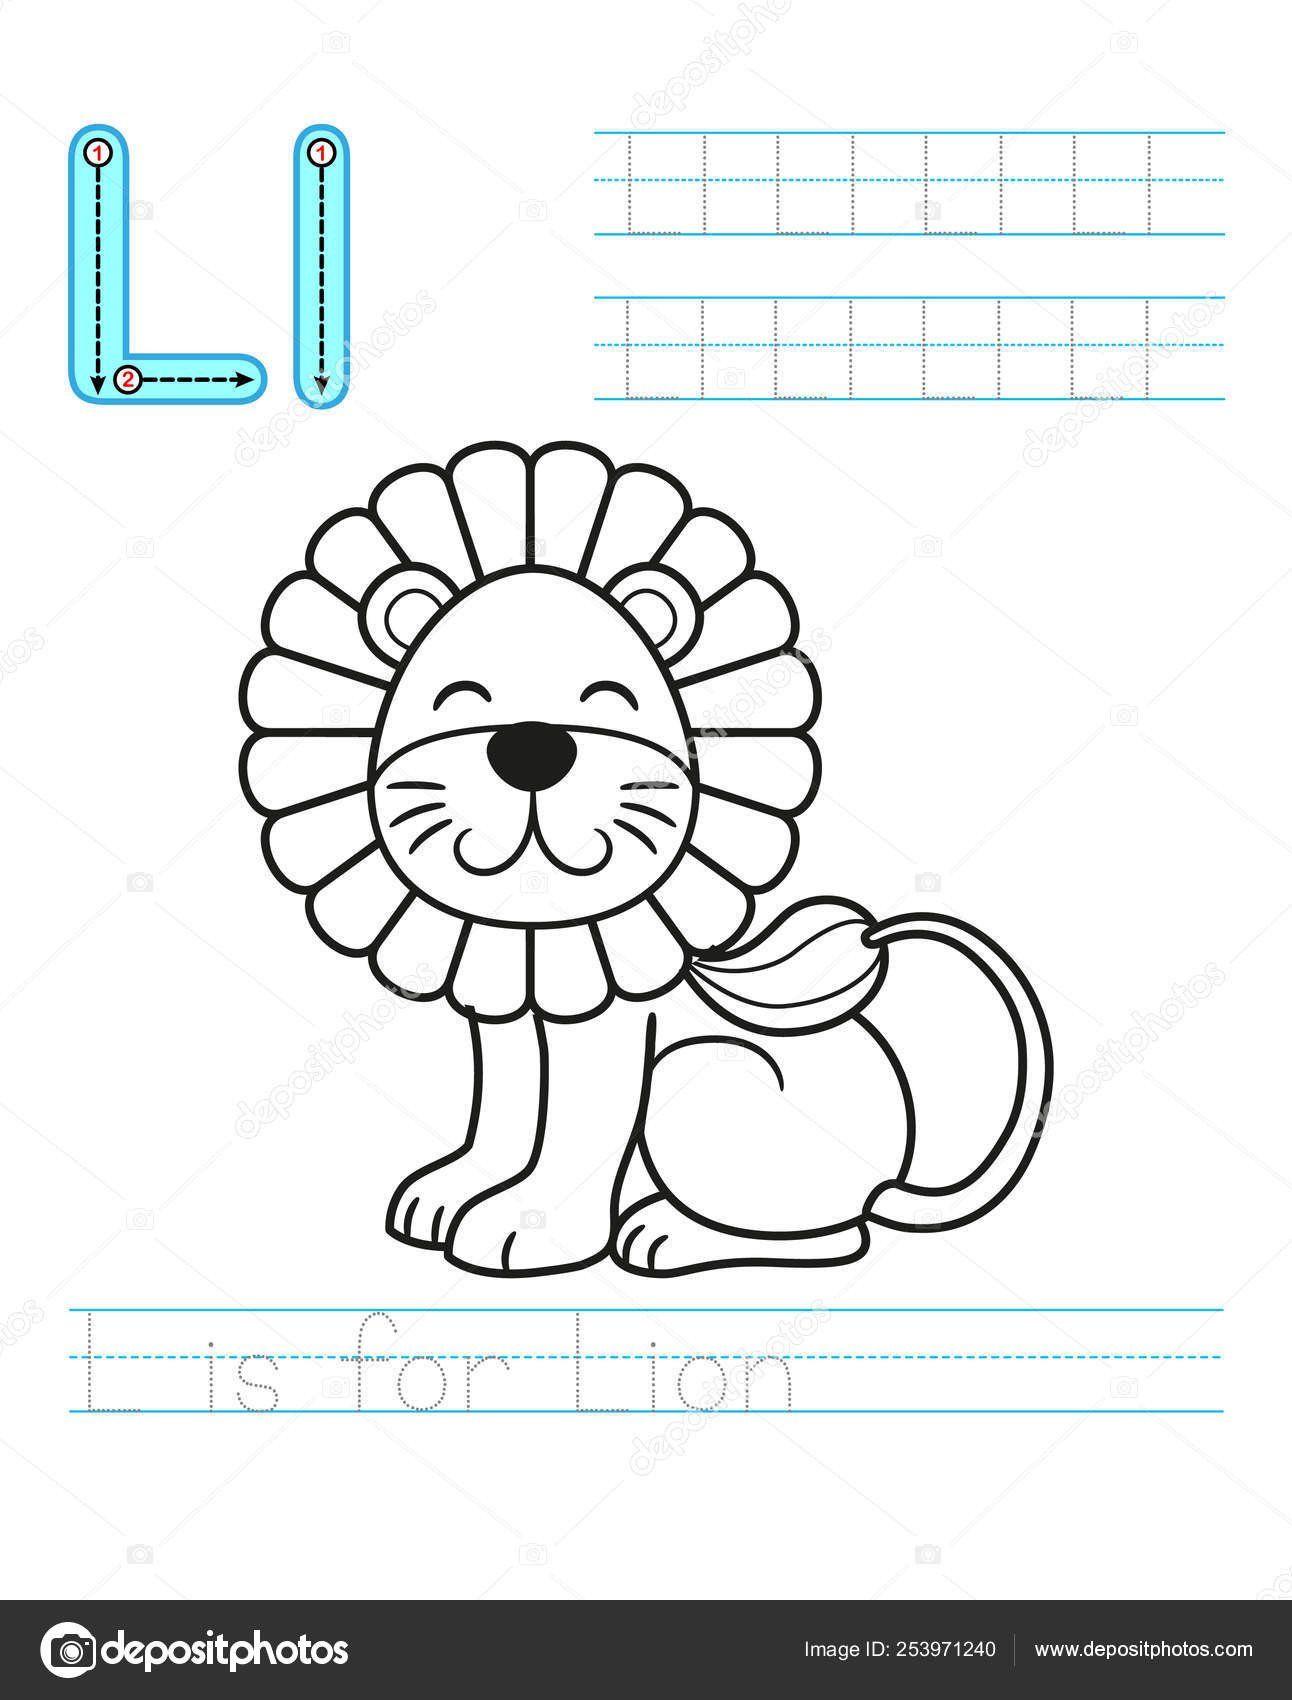 Letter L Preschool Worksheet Coloring Book Page Printable